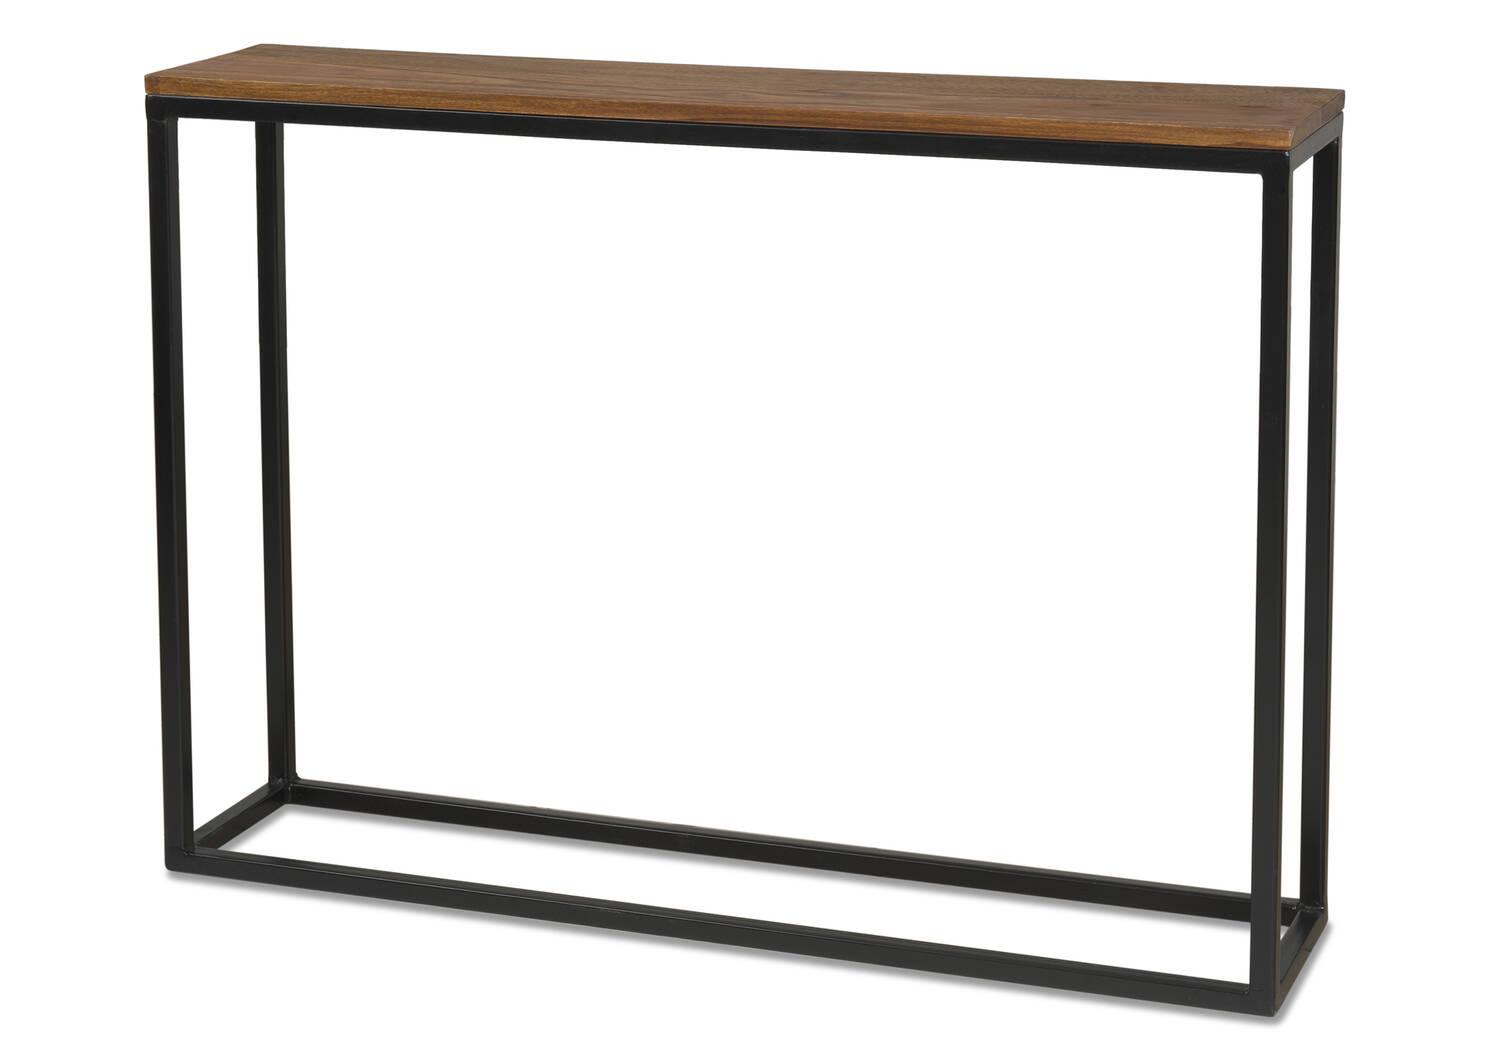 Crosby Narrow Console Table -Sheesham Co